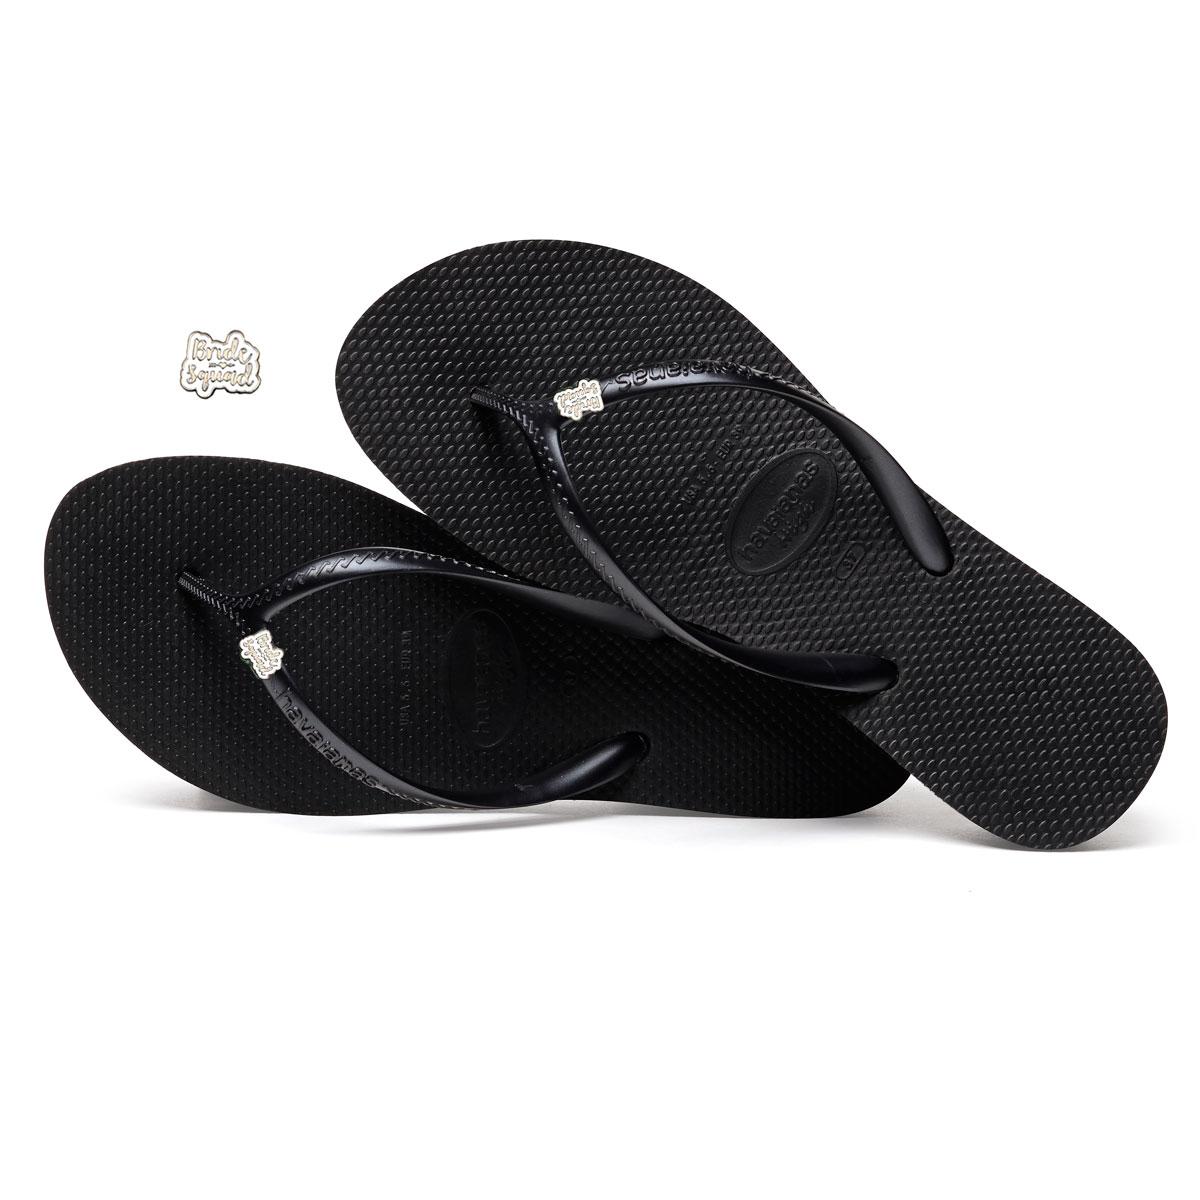 Havaianas Heel Black Flip-Flops with Silver & White Bride Squad Charm